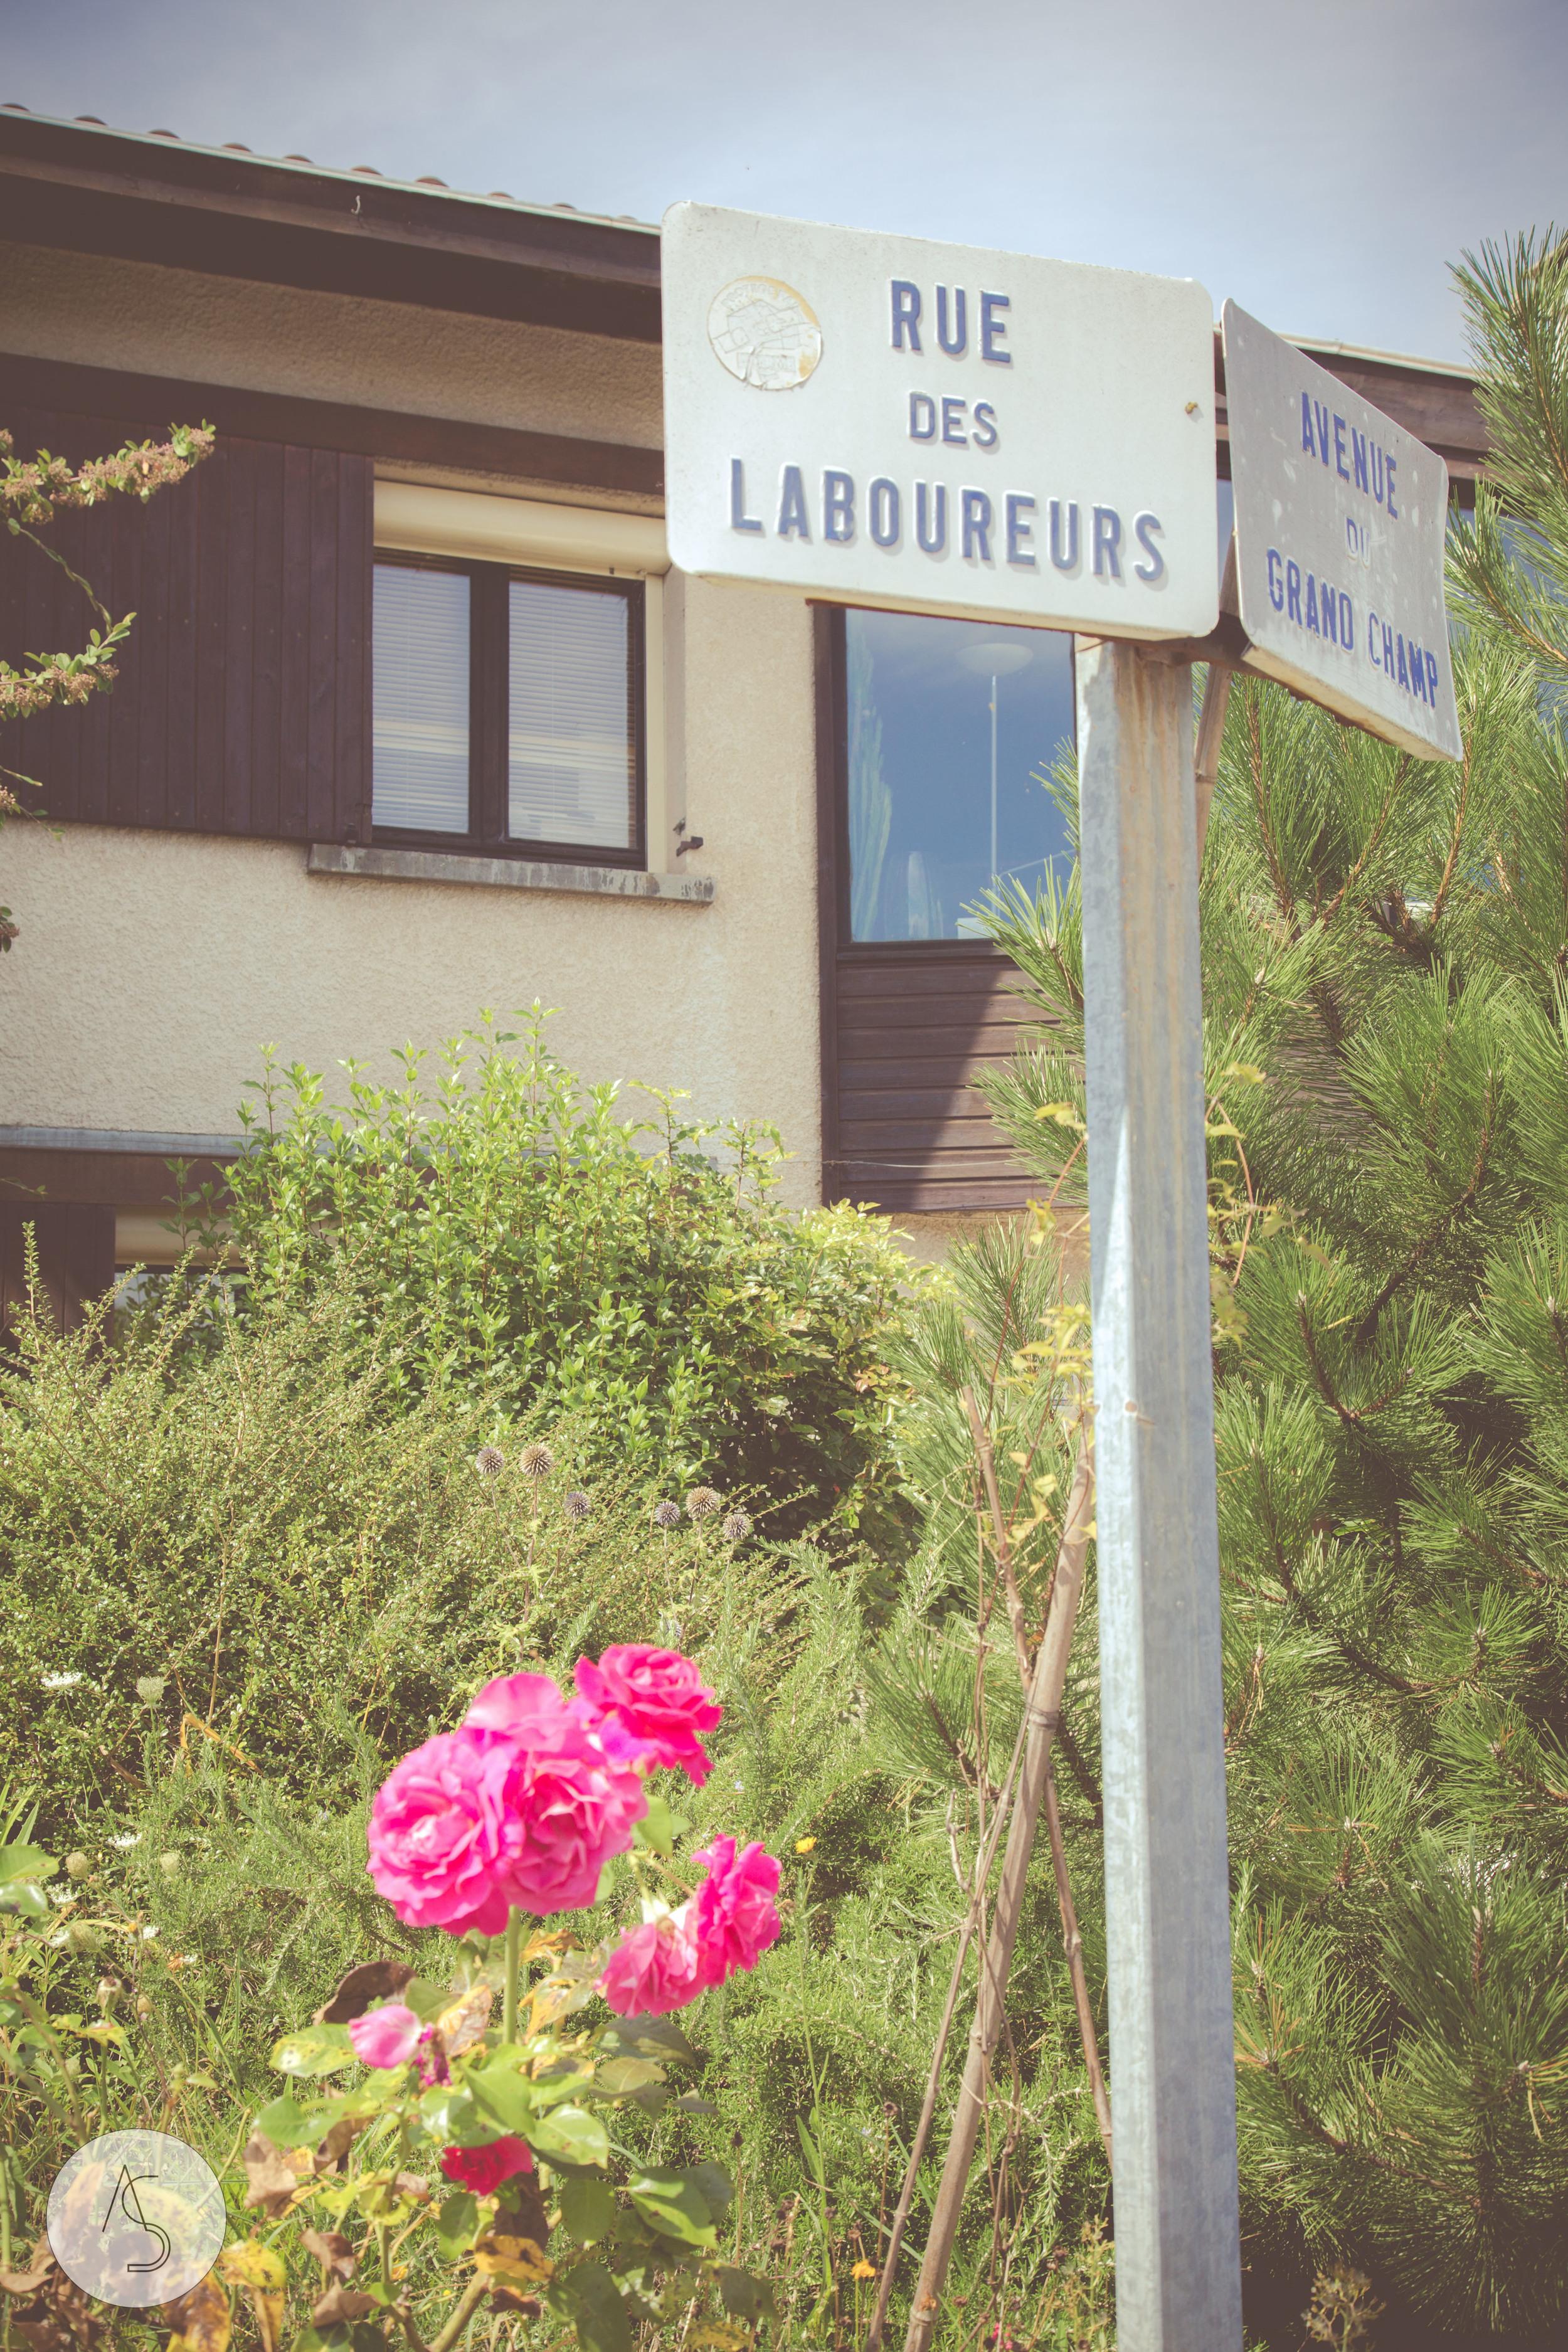 photographe mariage - Grenoble - Rhone Alpes - Adriana Salazar photo-34.jpg